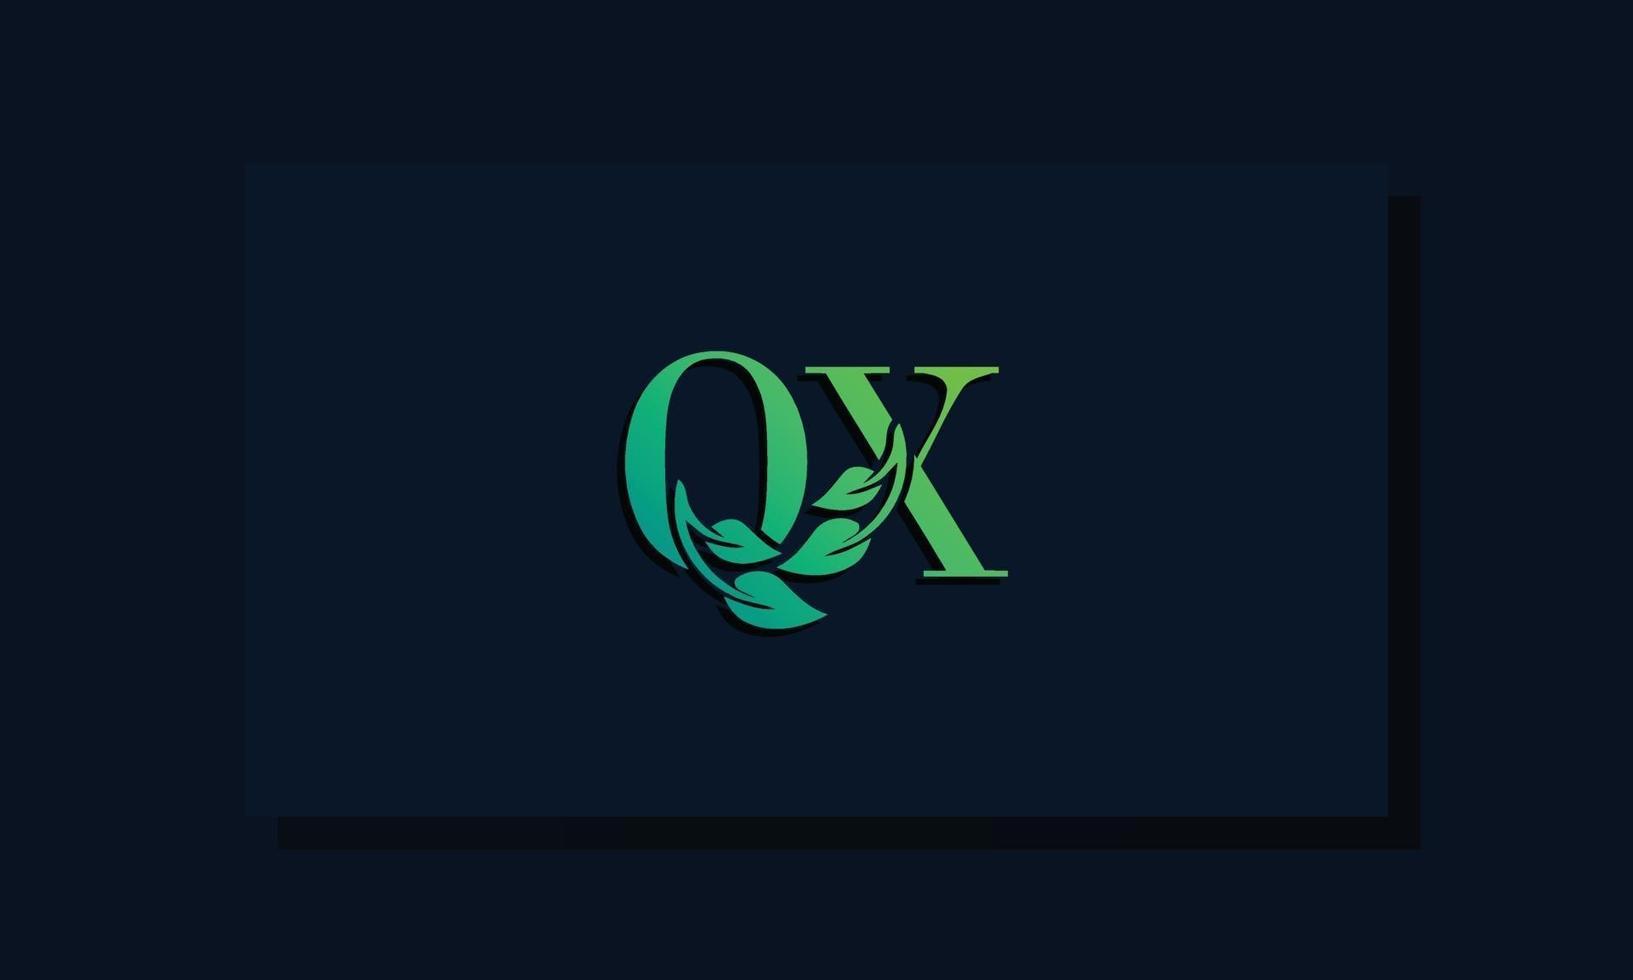 Minimal leaf style Initial QX logo vector